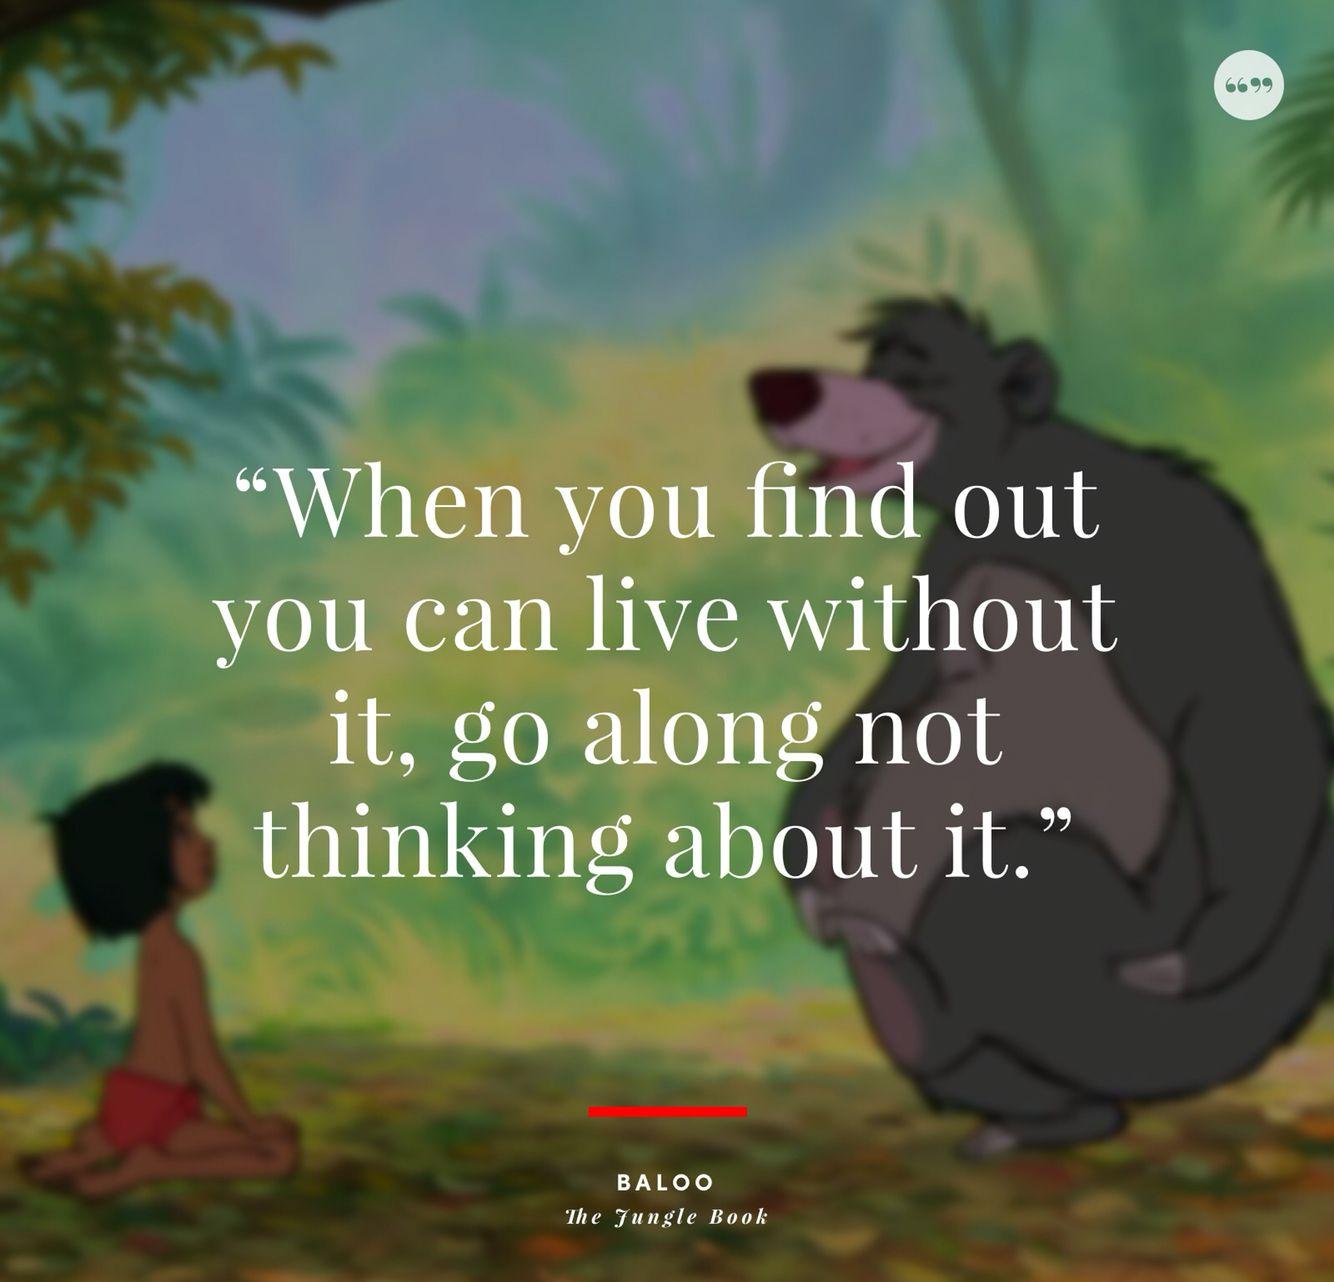 Baloo The Jungle Book Jungle Book Quotes Cartoon Quotes Jungle Book